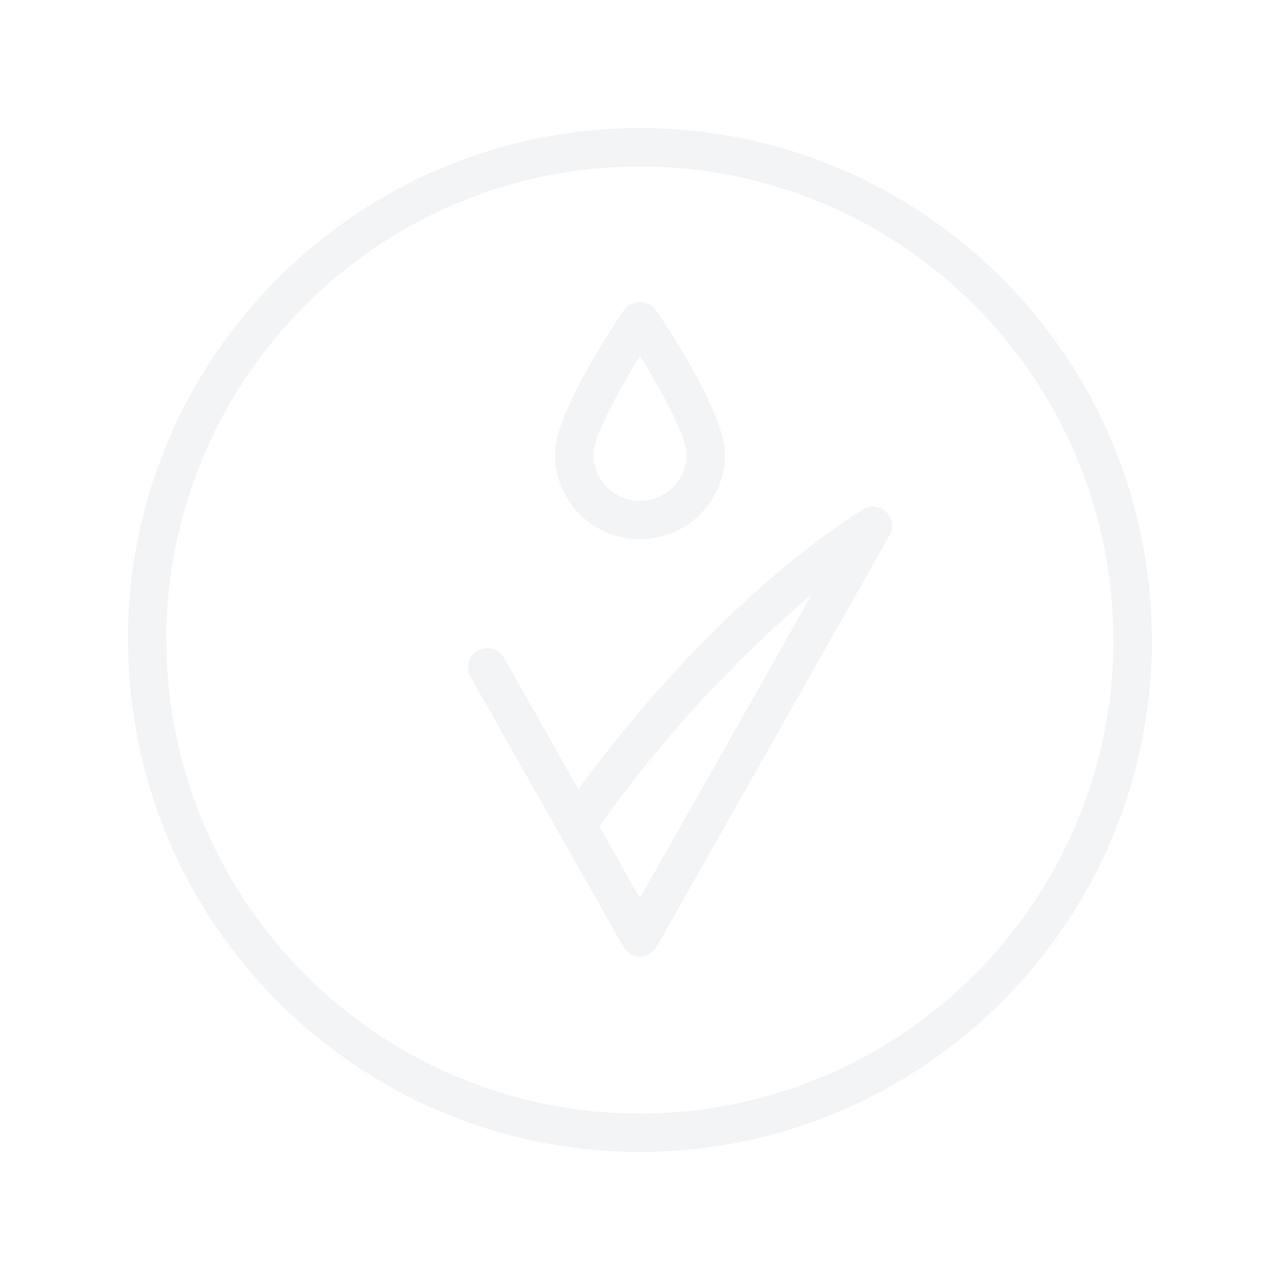 ELIZABETH ARDEN White Tea 50ml Eau De Toilette Gift Set подарочный набор